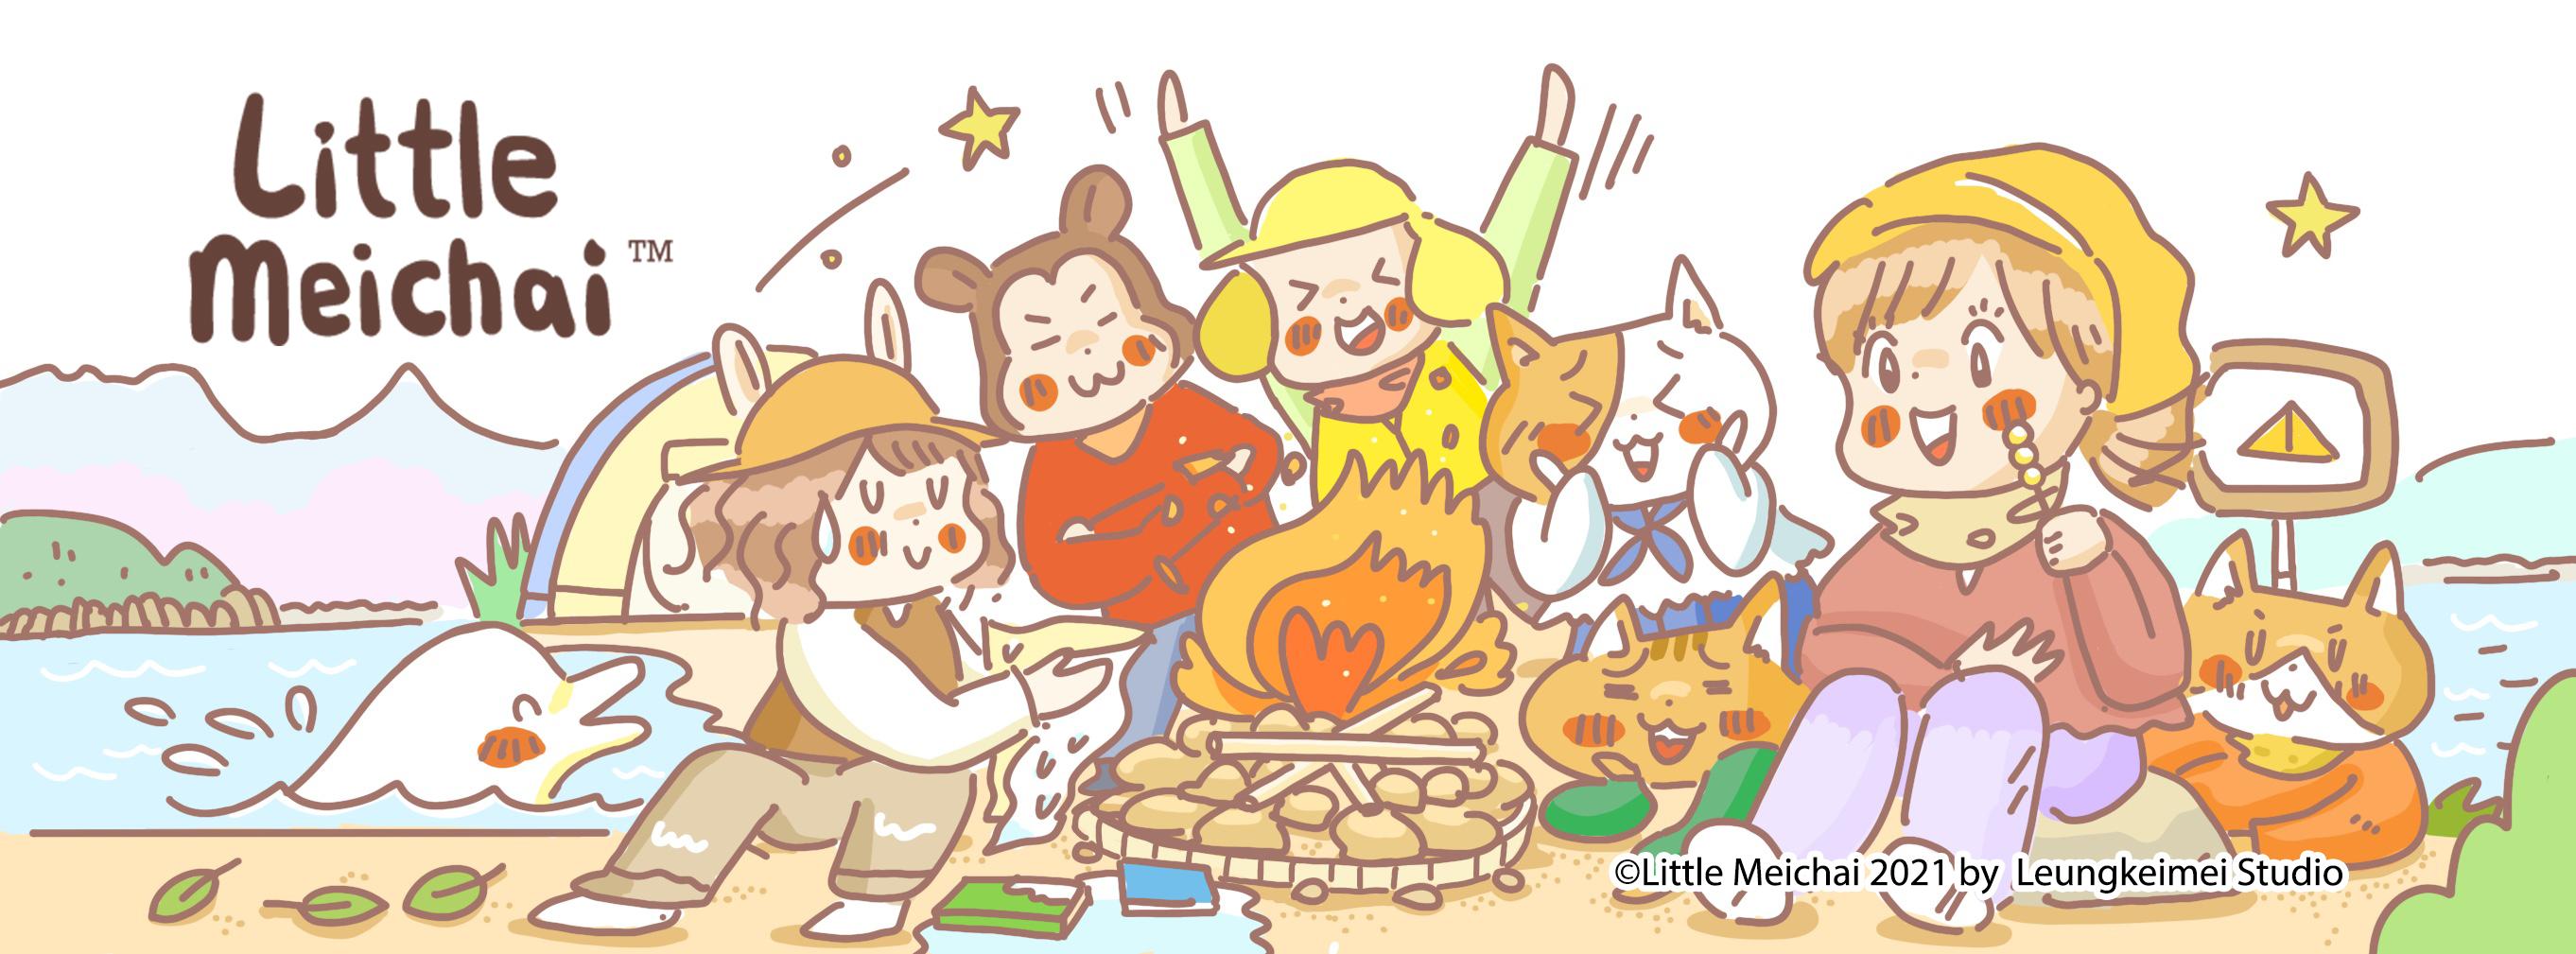 littlemeichai_fb_banner